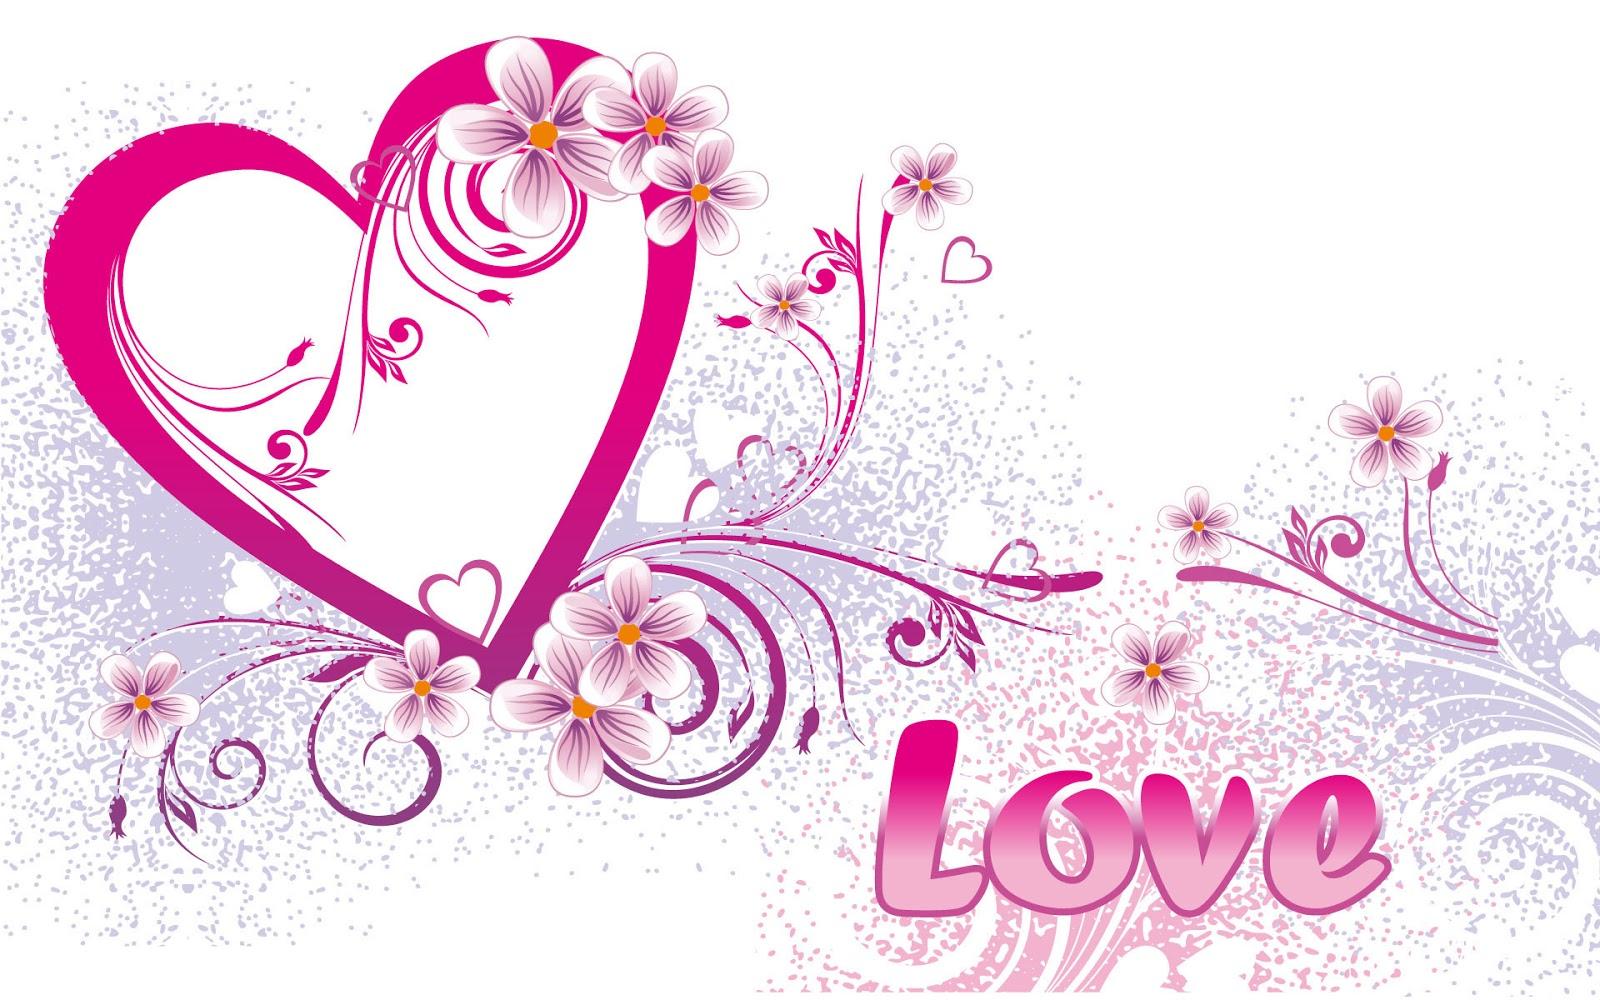 Best Love Wallpaper Free Love Wallpapers